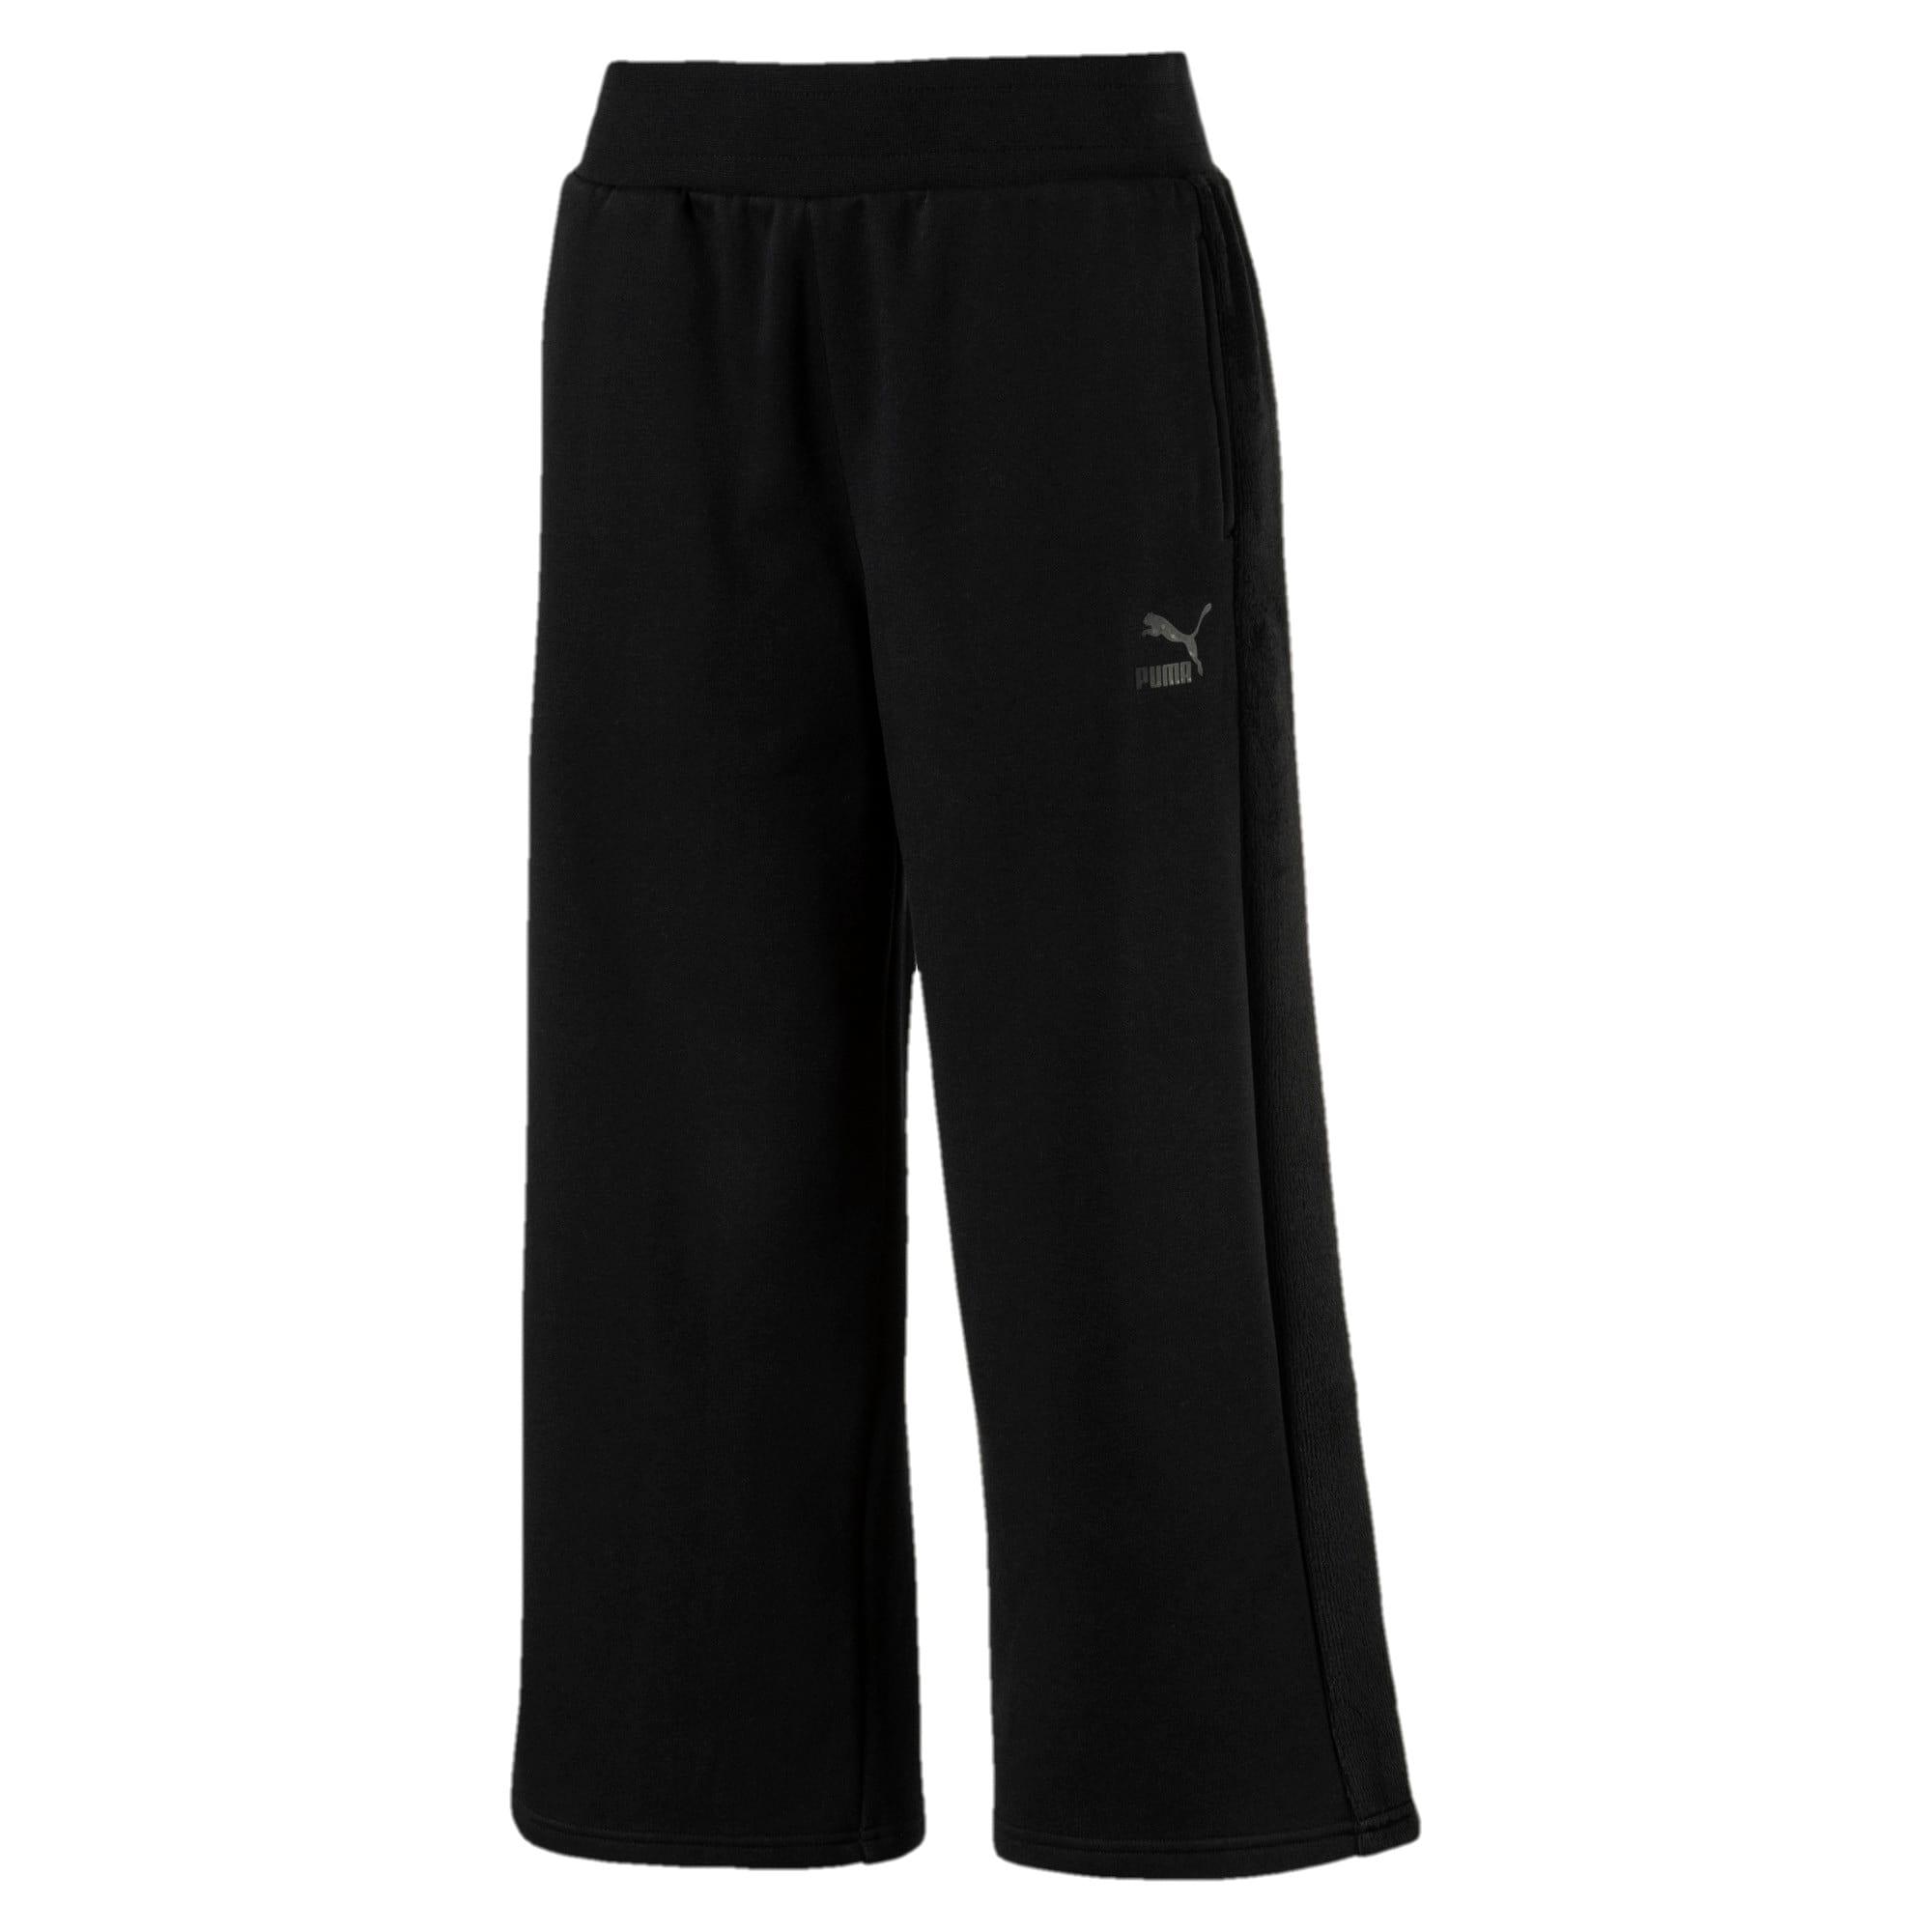 Thumbnail 1 of Classics Women's Winterized Archive Logo T7 Pants, Cotton Black, medium-IND